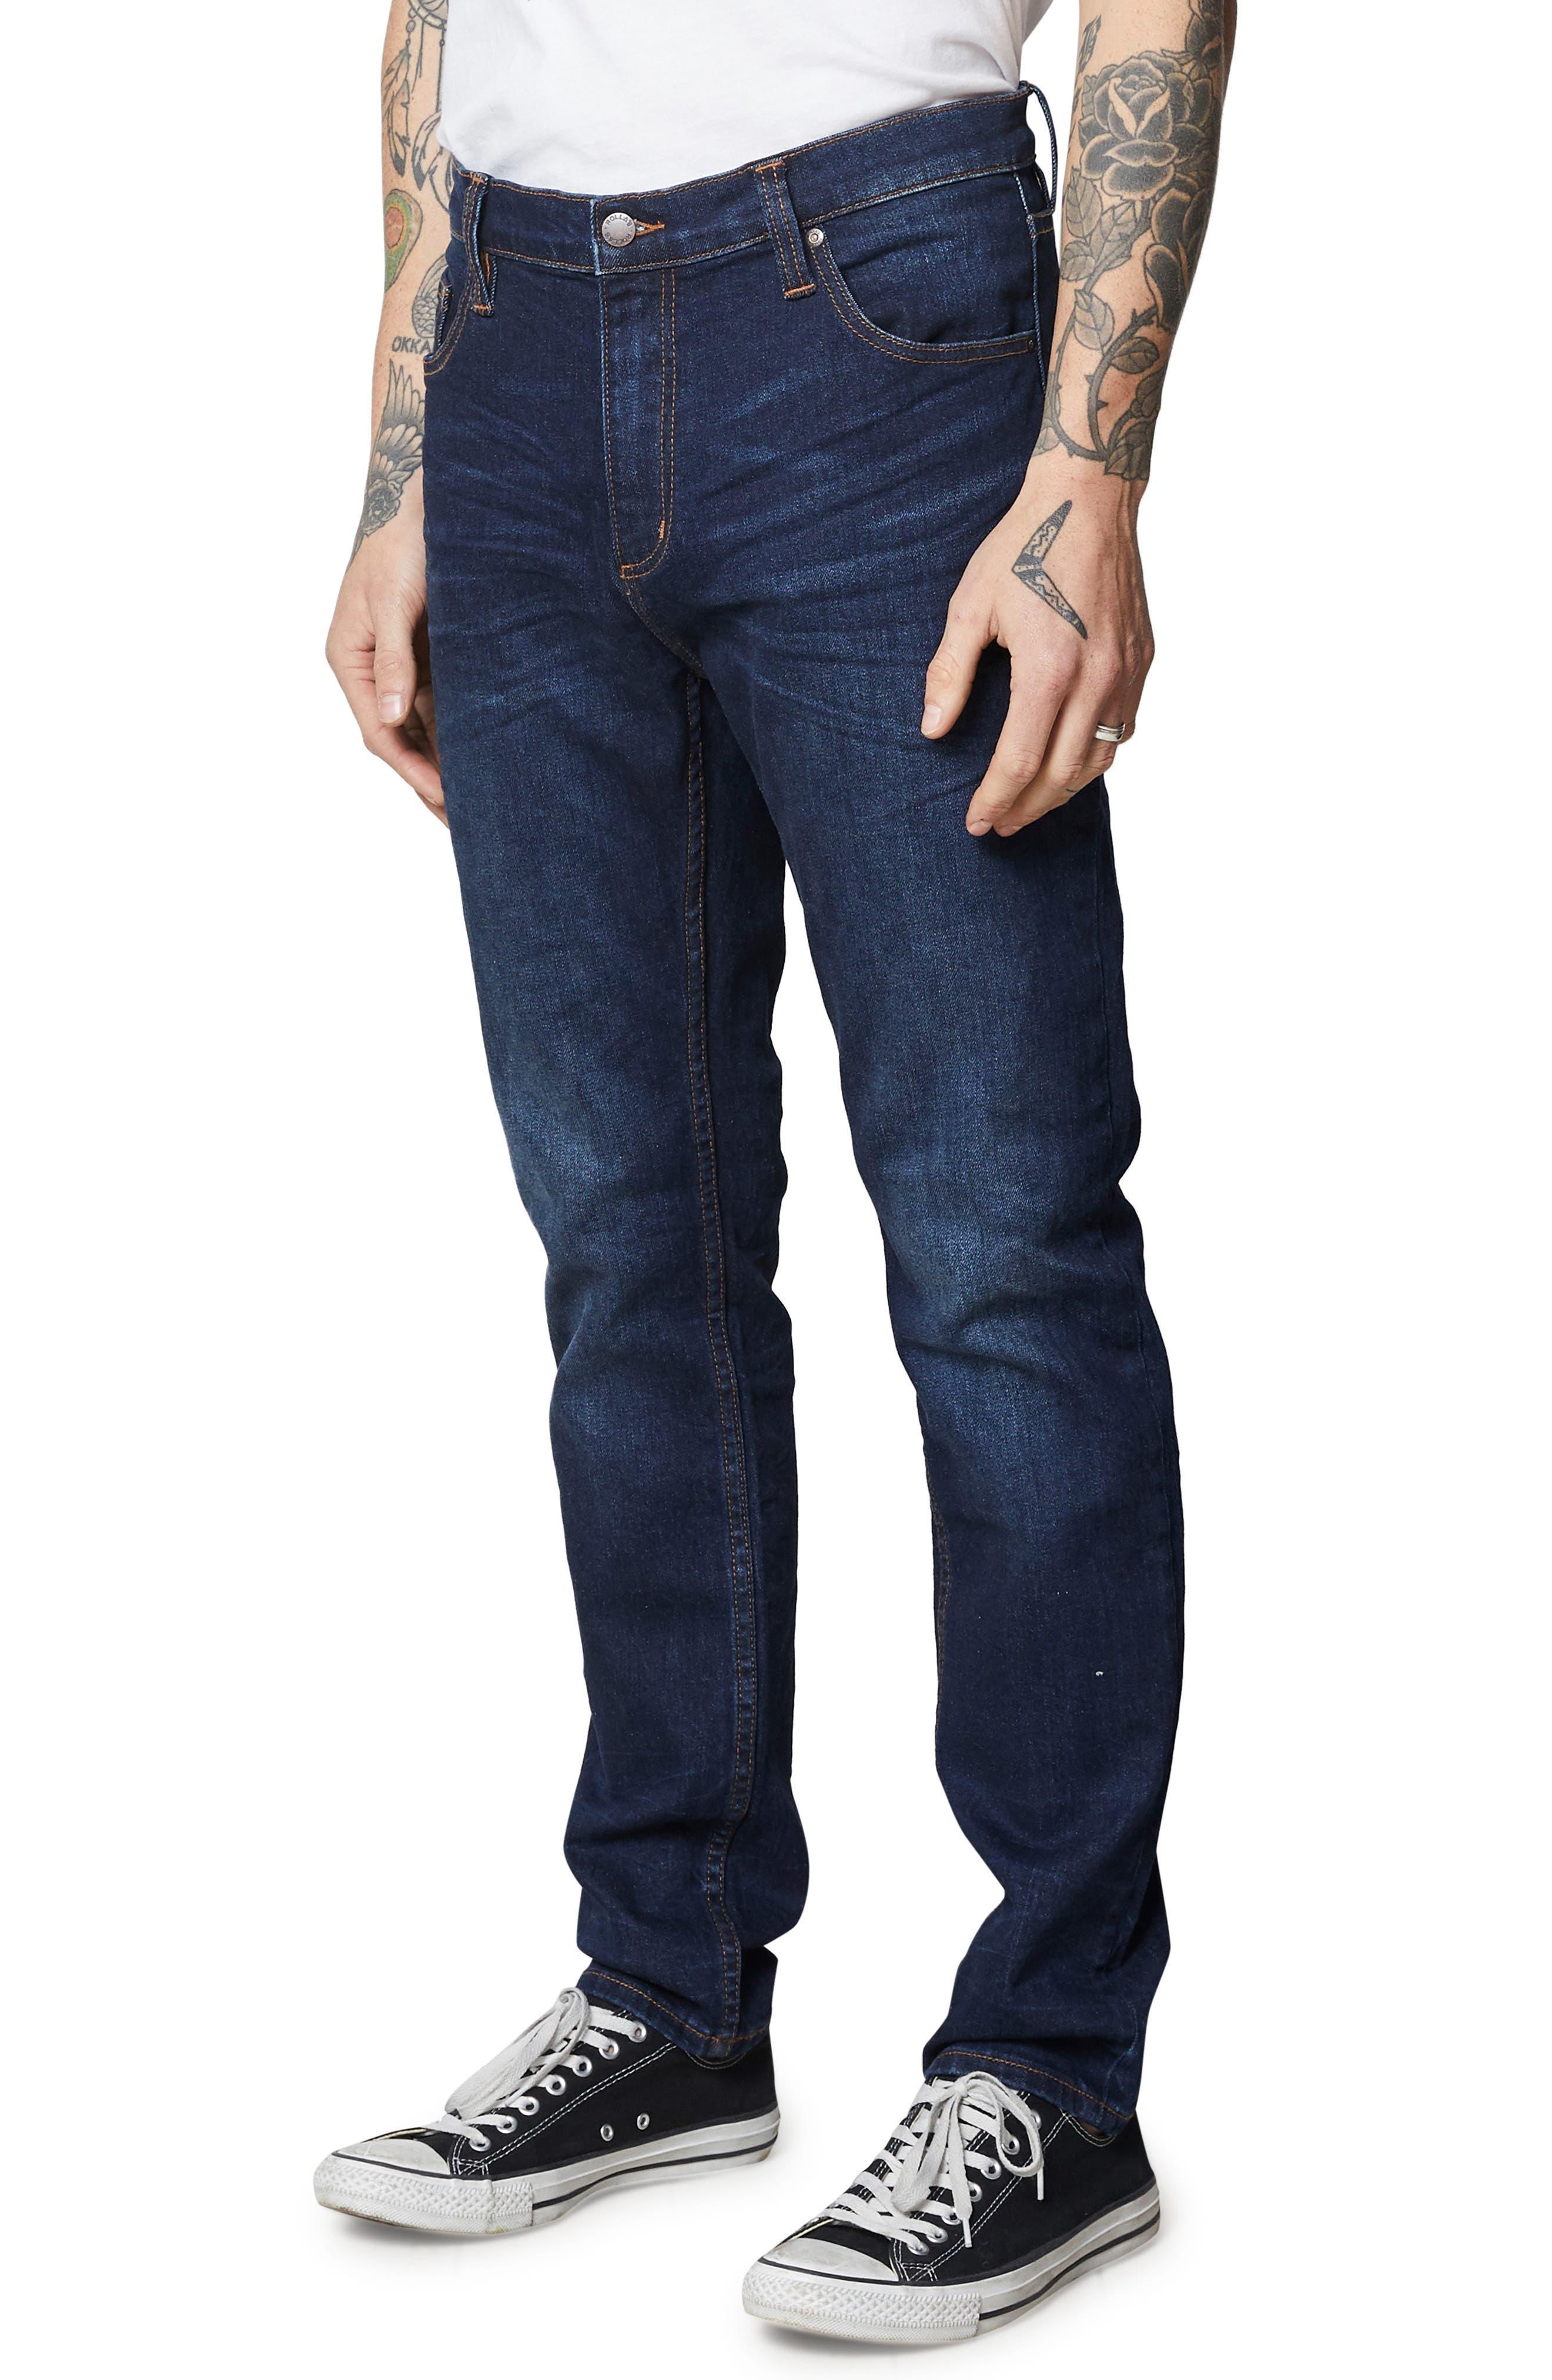 ROLLA'S,                             Tim Slims Slim Fit Jeans,                             Alternate thumbnail 3, color,                             406